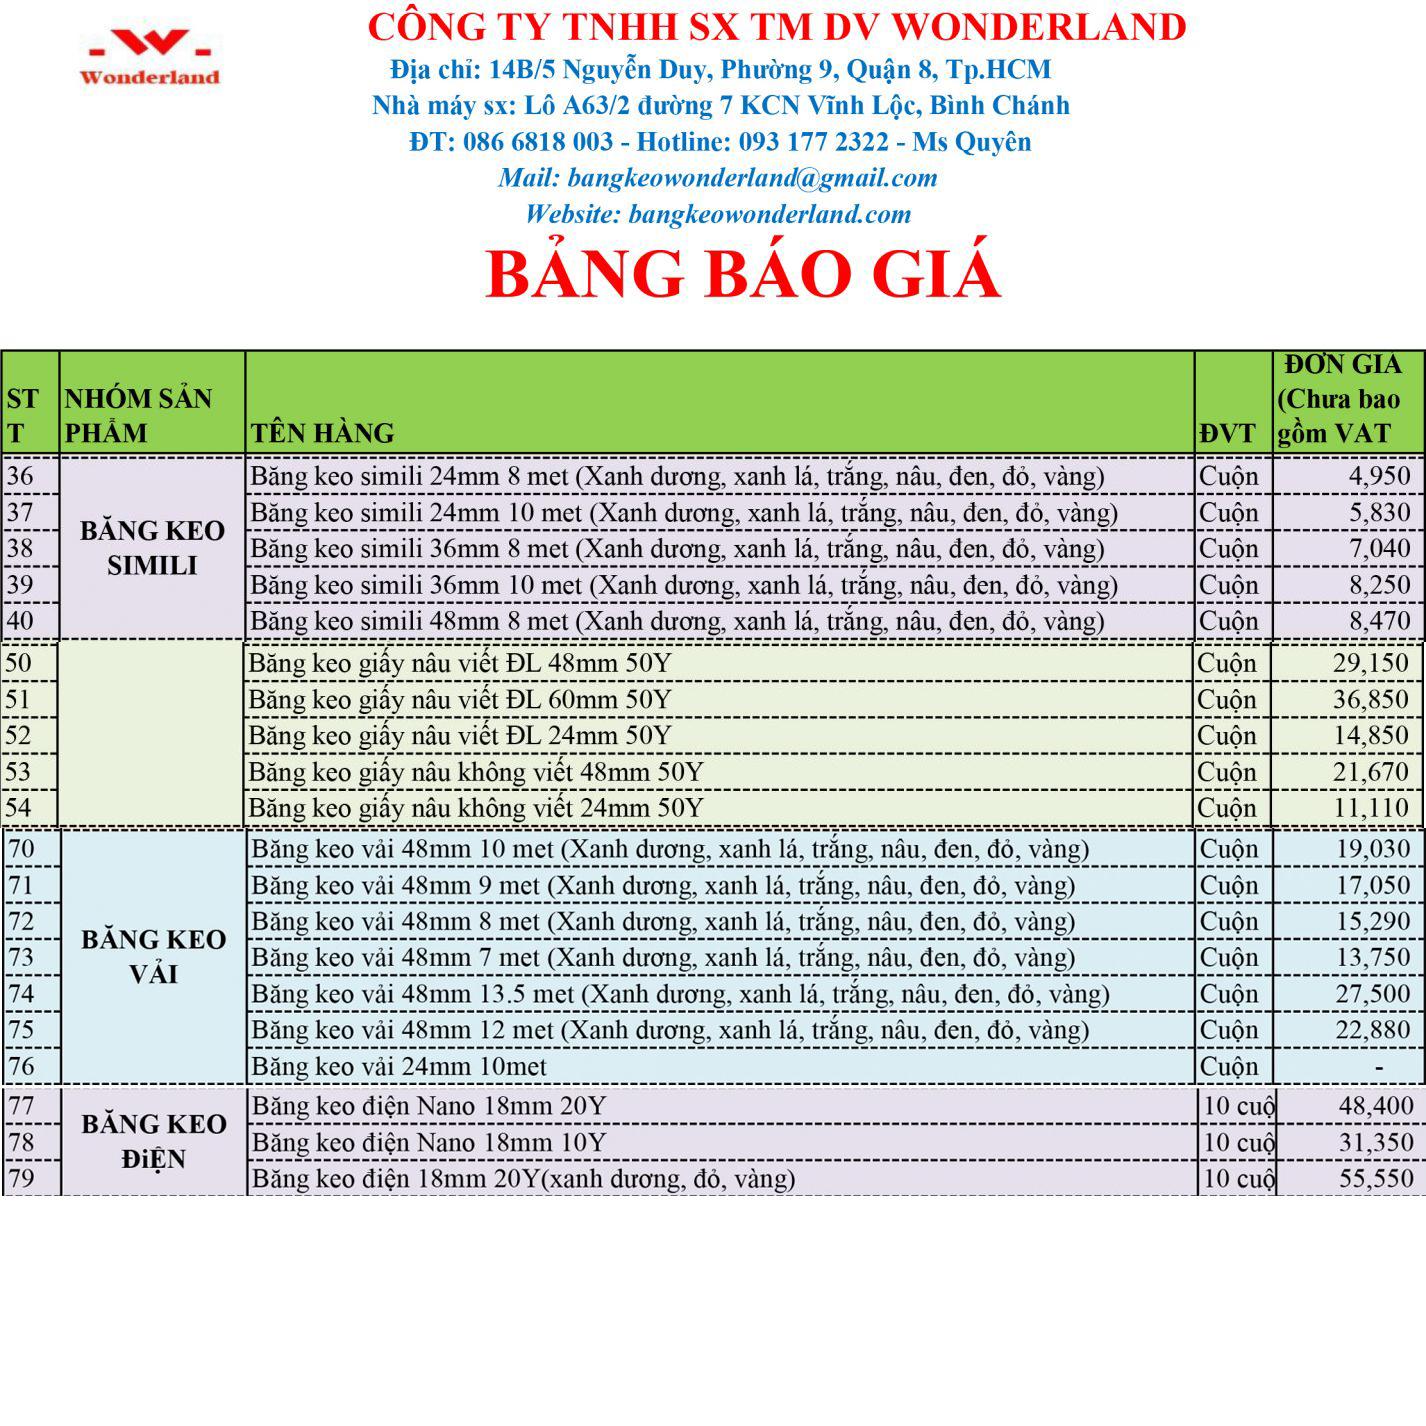 bang-bao-gia-bang-keo-cong-nghiep